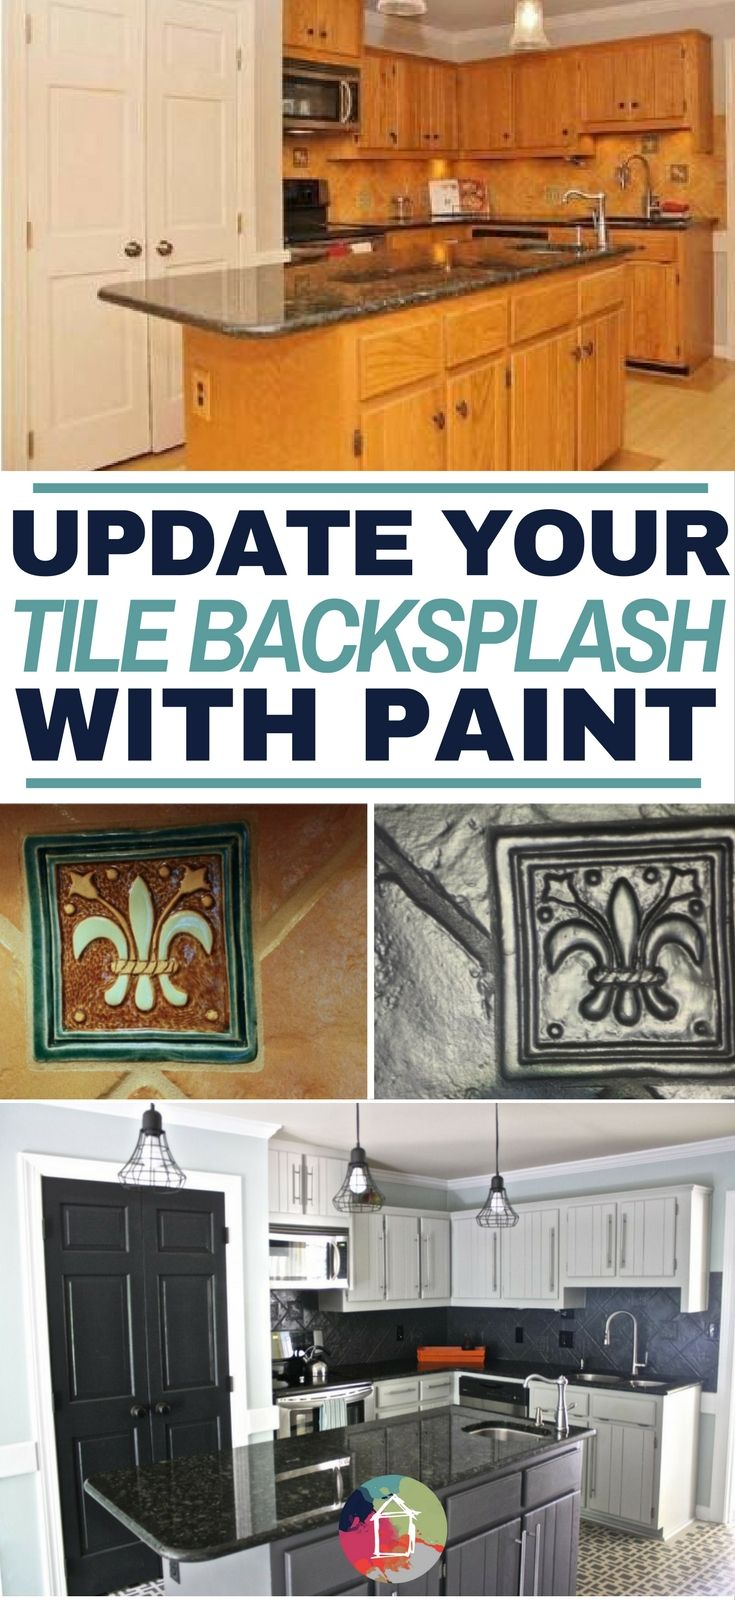 Painting Kitchen Tiles: Best 25+ Painting Tile Backsplash Ideas On Pinterest